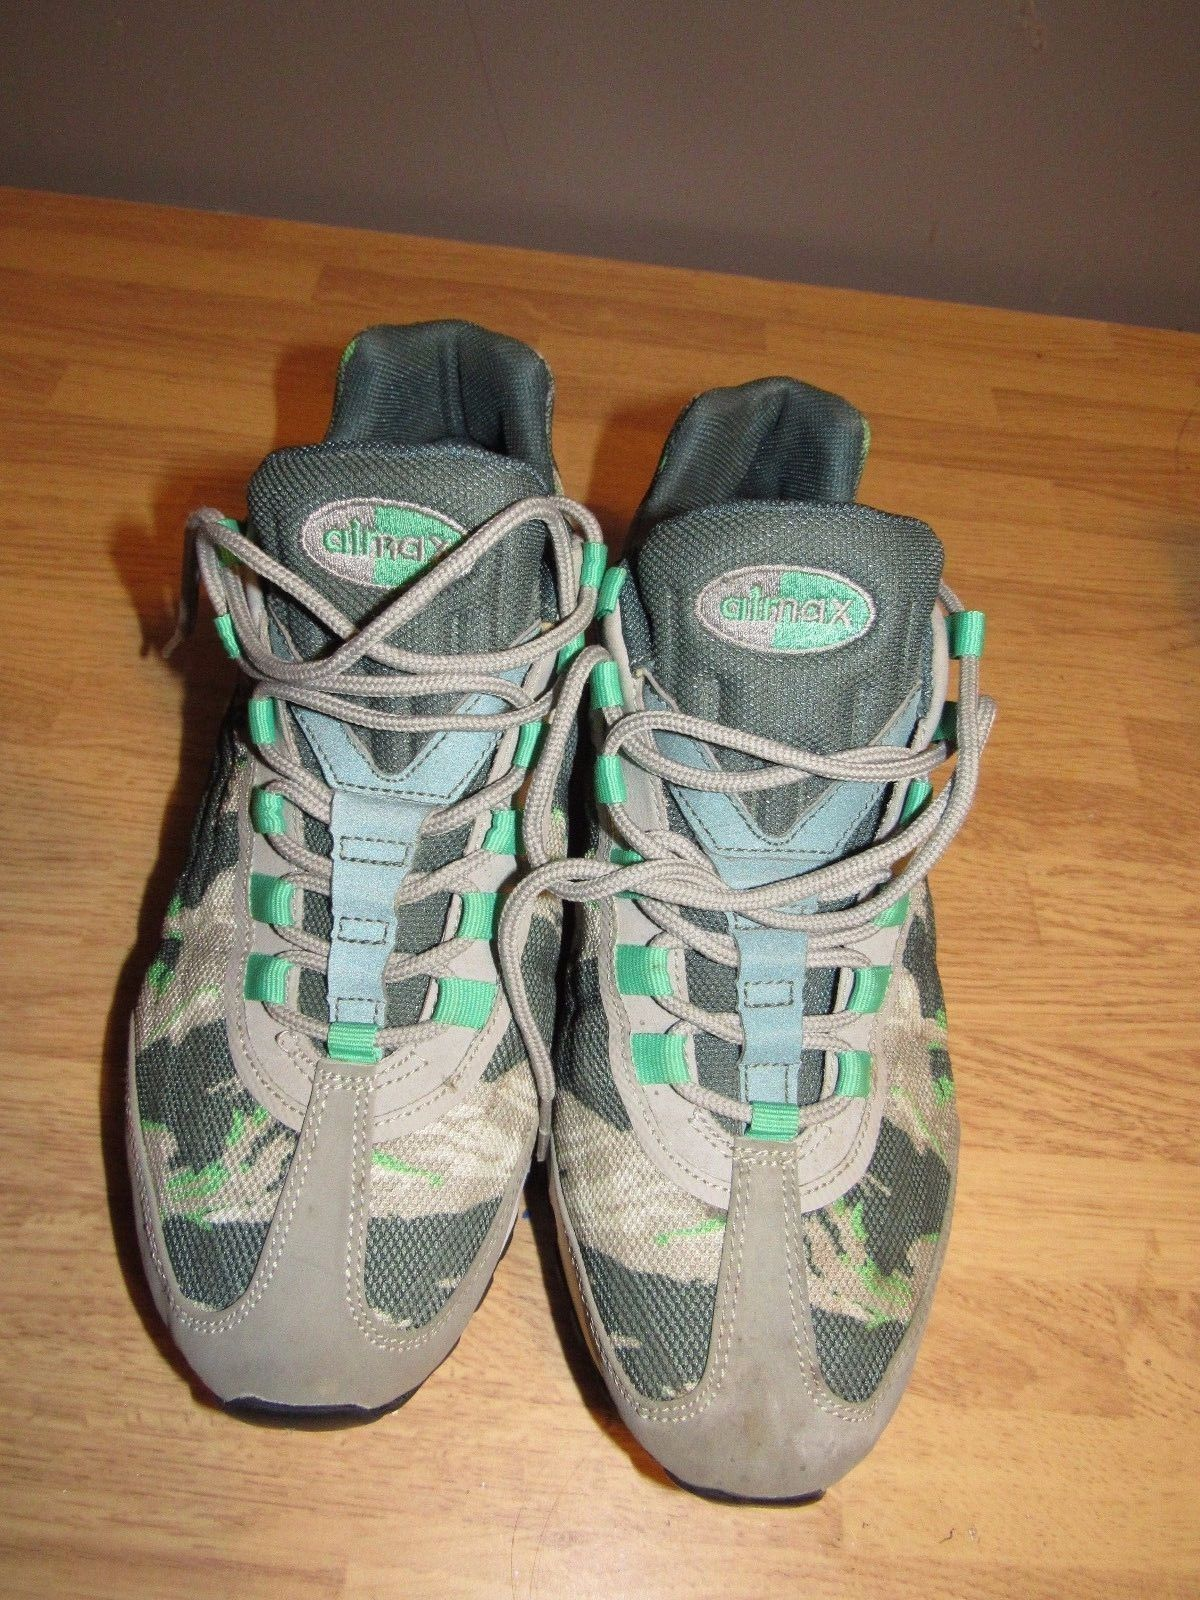 Men Shoes NIKE AIR MAX MEN'S CAMO SHOES SNEAKERS SIZE 10 599425 030